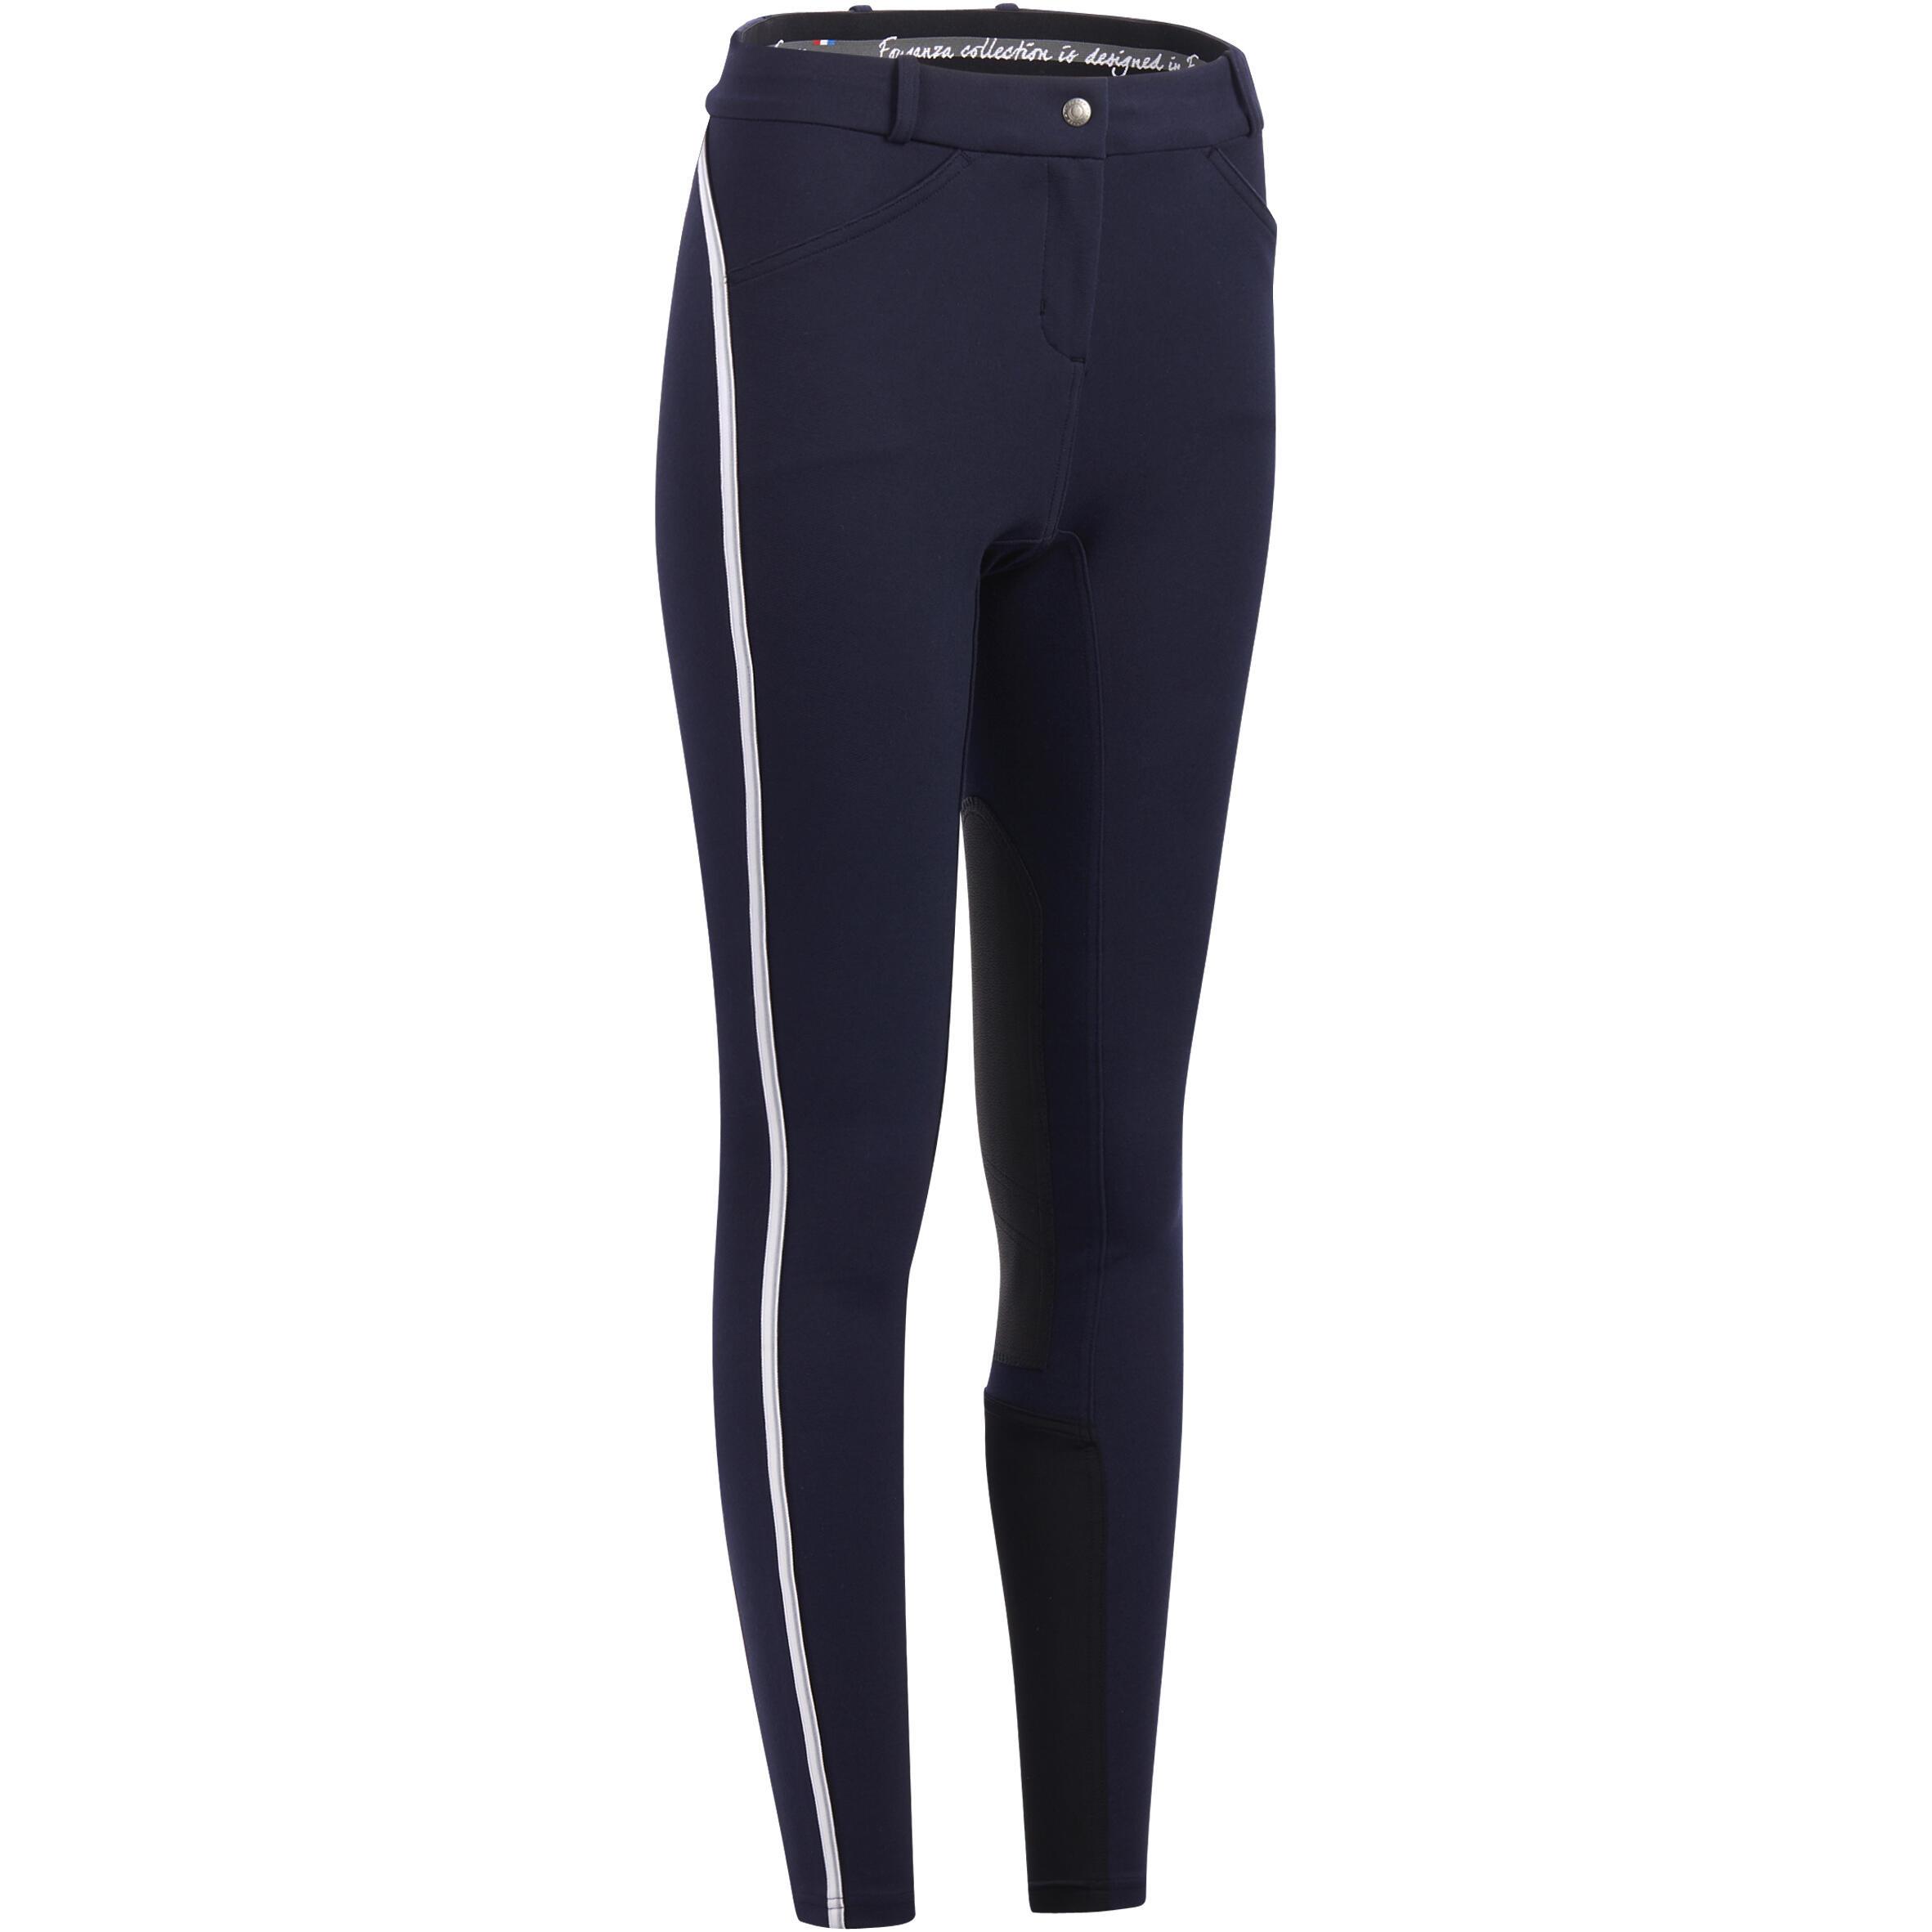 Reithose 140 Rutschfester Kniebesatz Damen marineblau   Sportbekleidung > Sporthosen > Sonstige Sporthosen   Blau - Grau   Fouganza